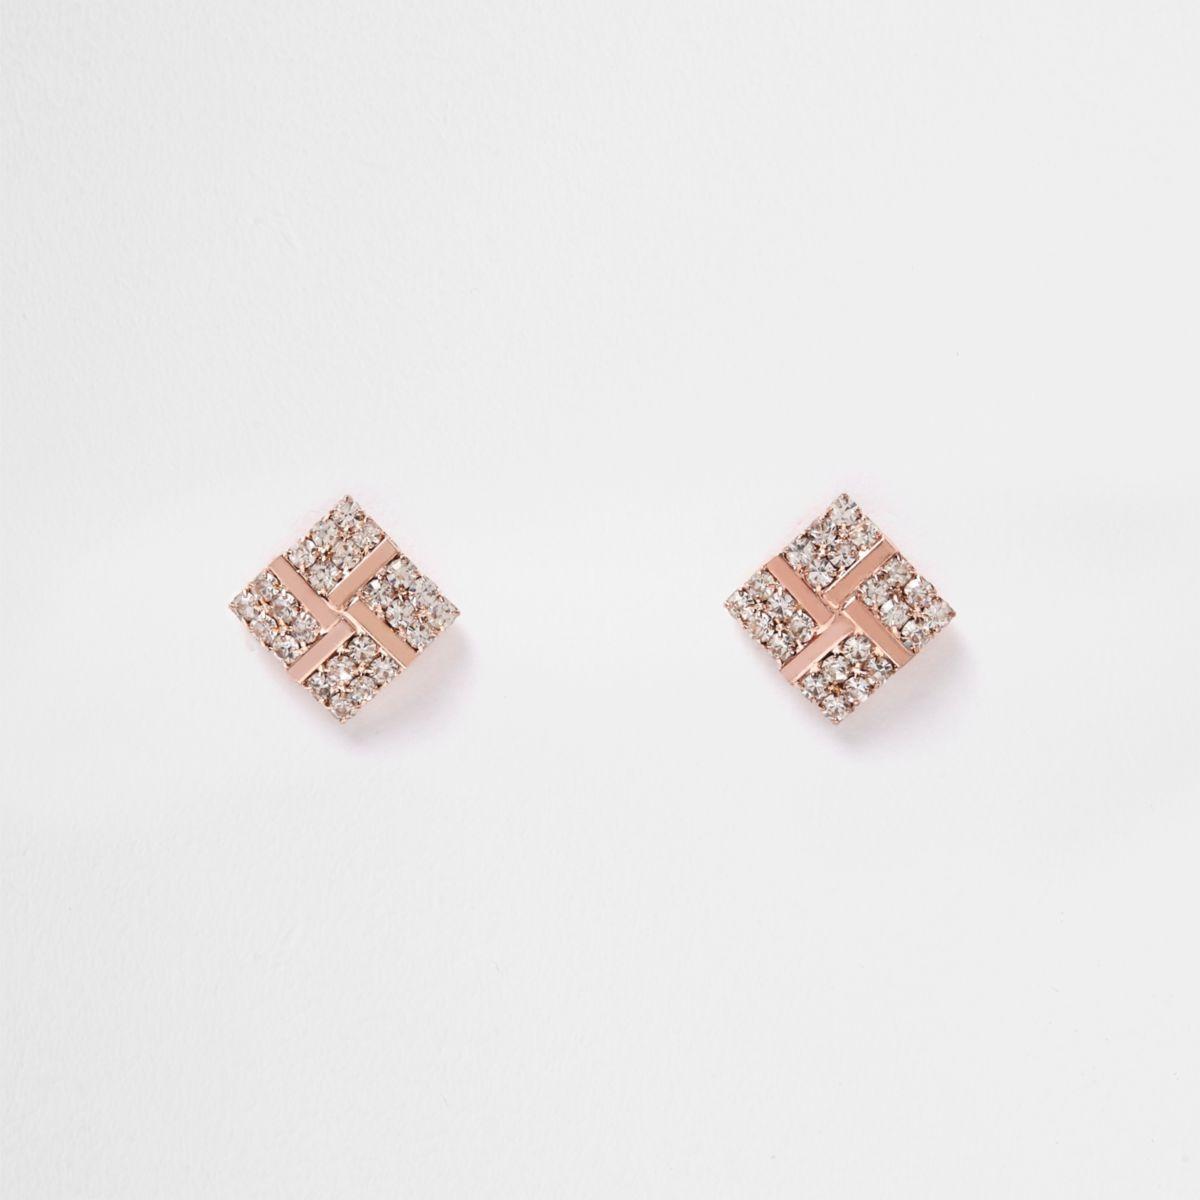 Rose gold tone diamante stud earrings